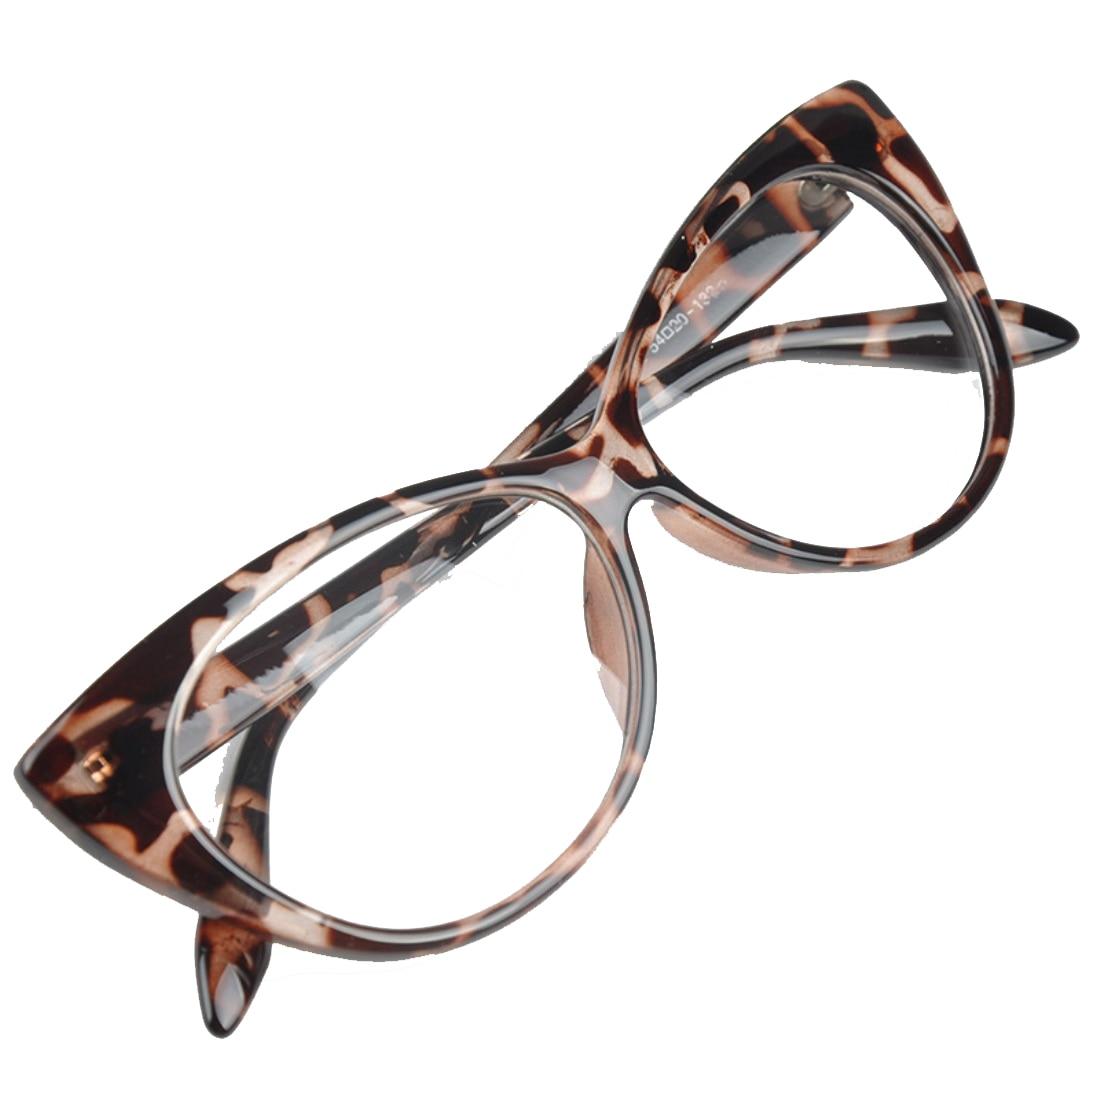 cod promoțional in stoc arata bine vanzare pantofi Rame - Ochelari cu lentile transparente cat eyes, leopard DyStyle - eMAG.ro